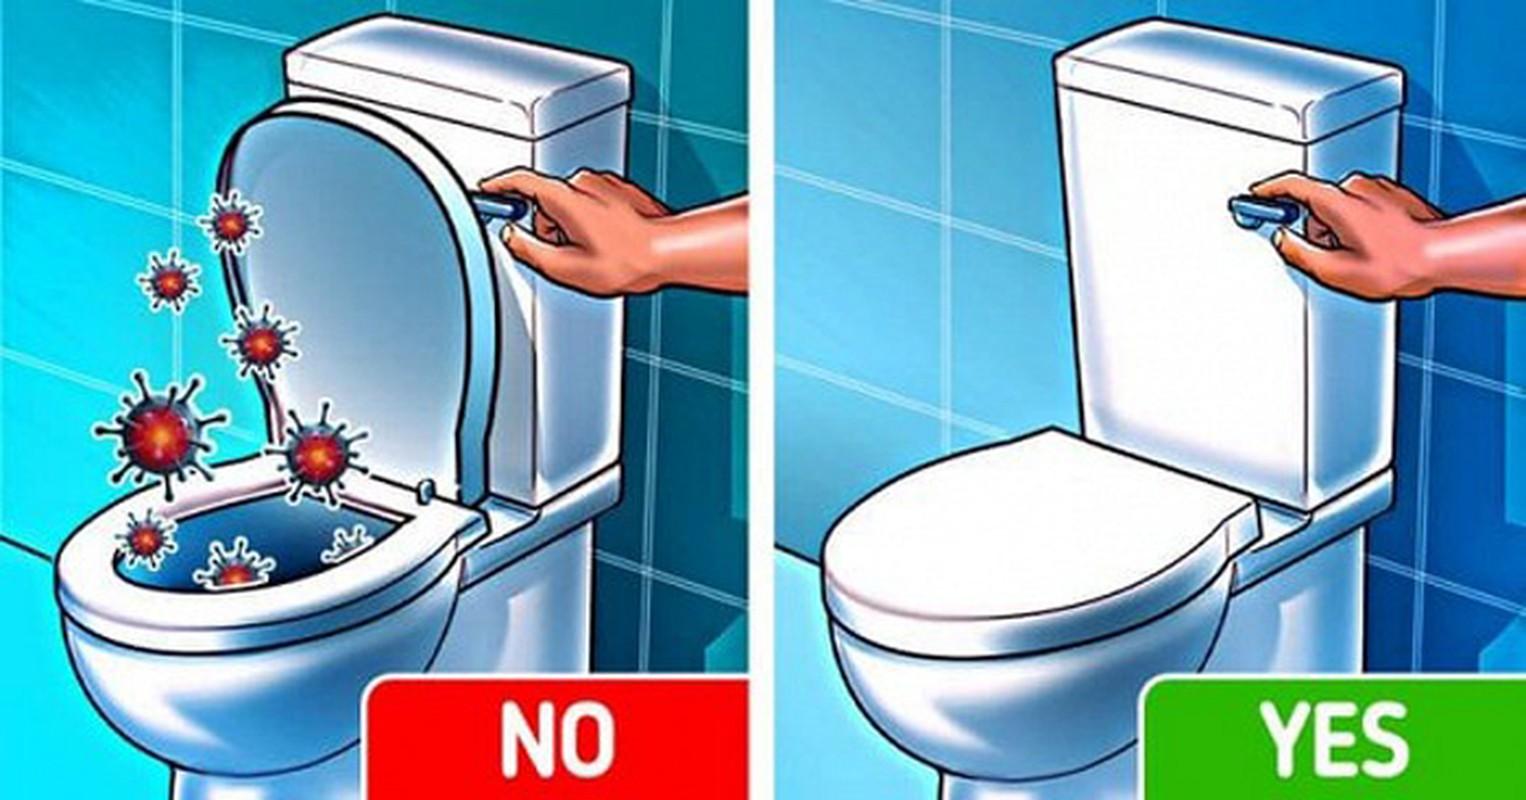 "Sai lam khi di toilet ""uy hiep"" tu cung, gan nhu ai cung mac"